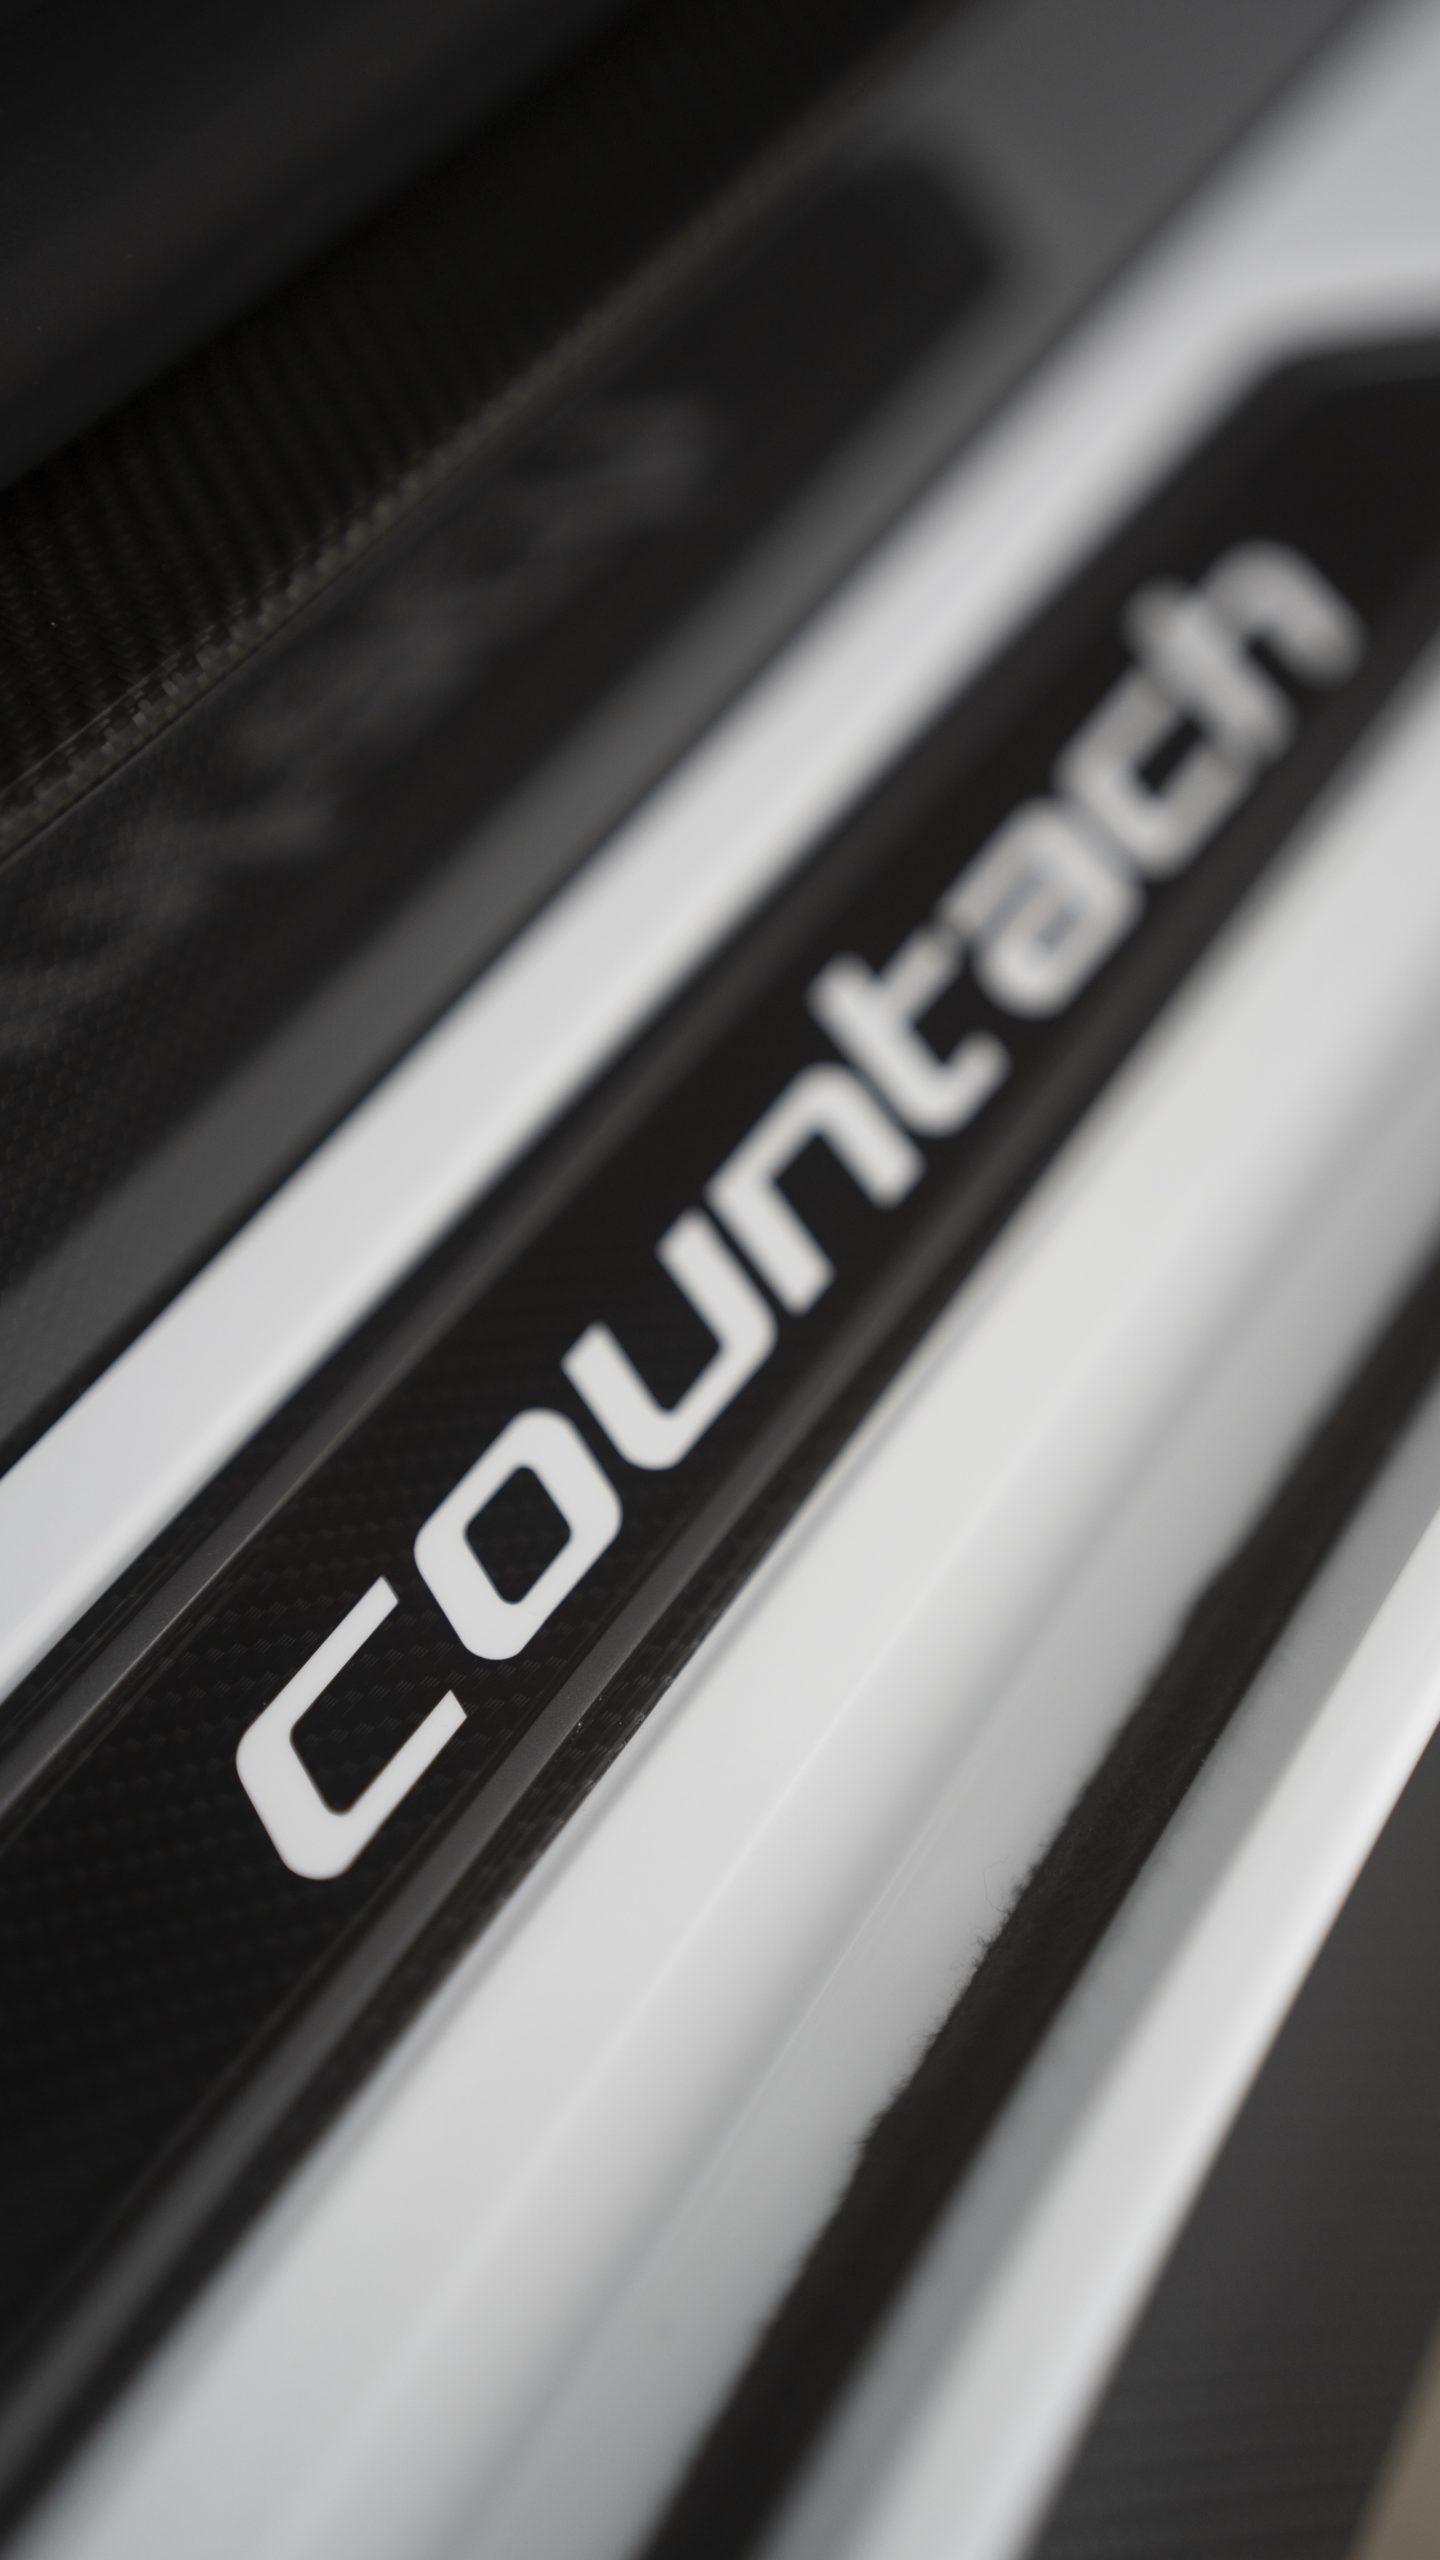 Countach LPI 800 sill plate detail